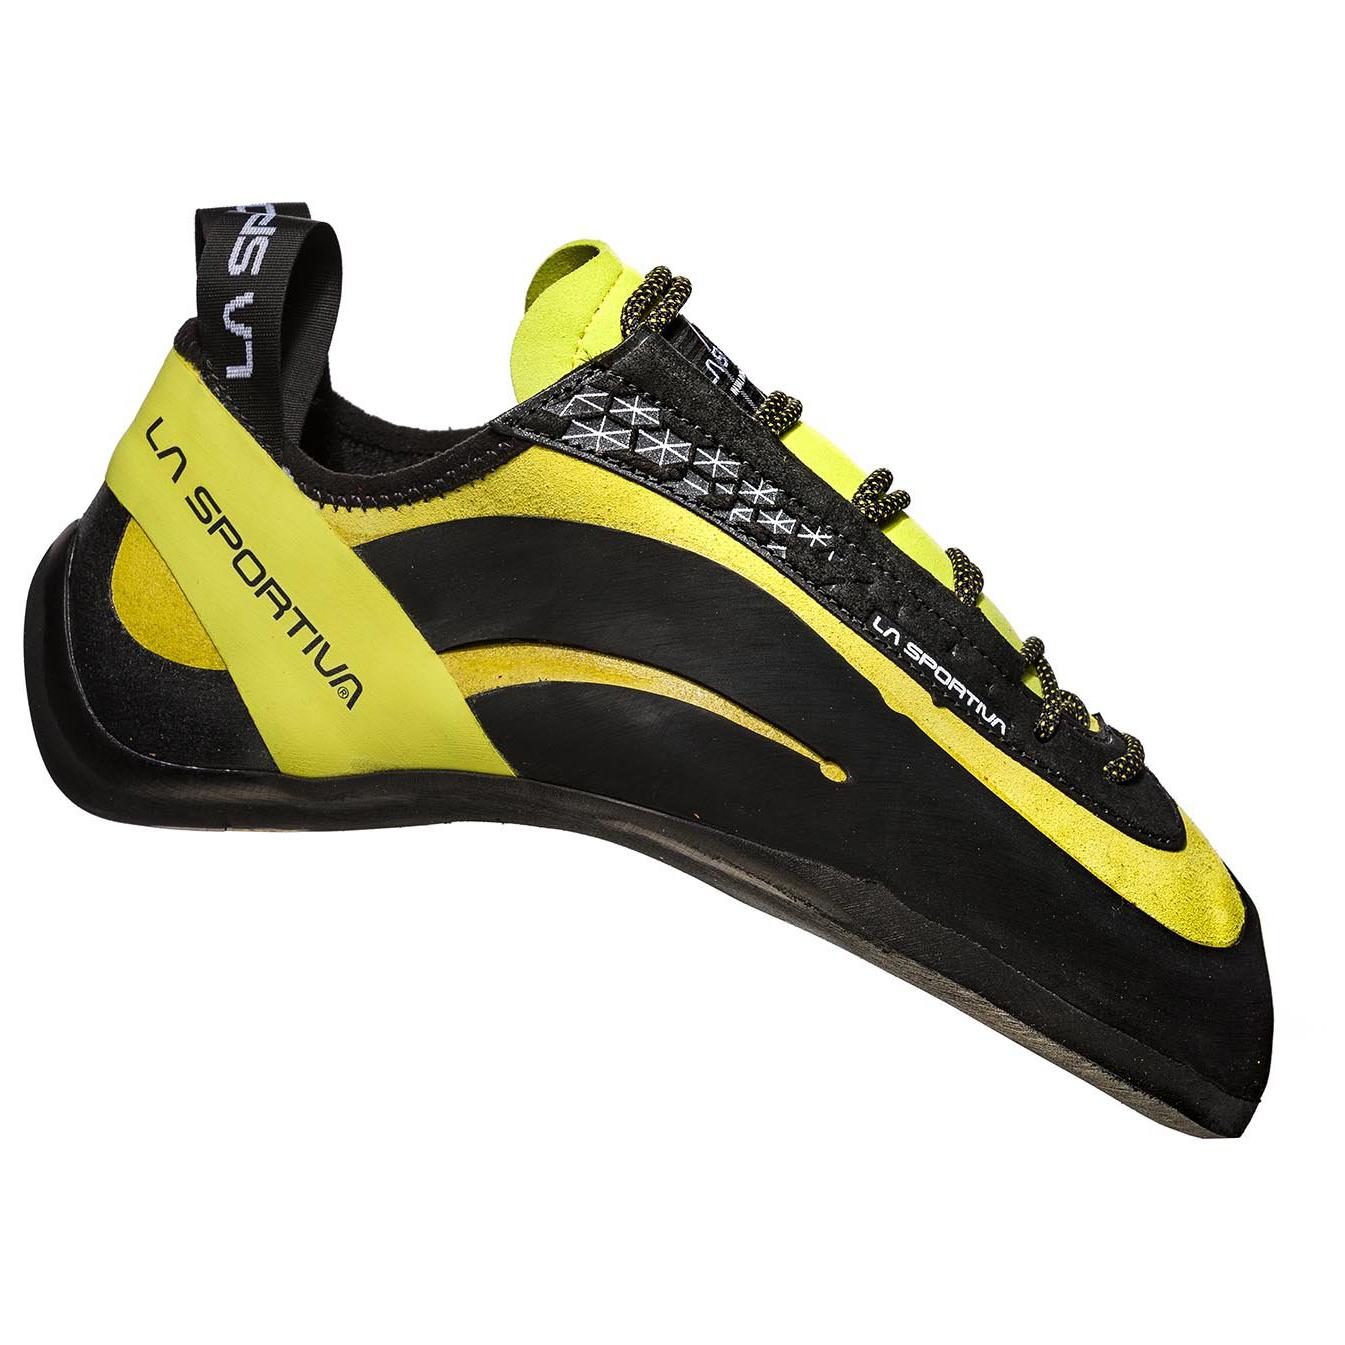 La Sportiva Miura - Climbing shoes Men